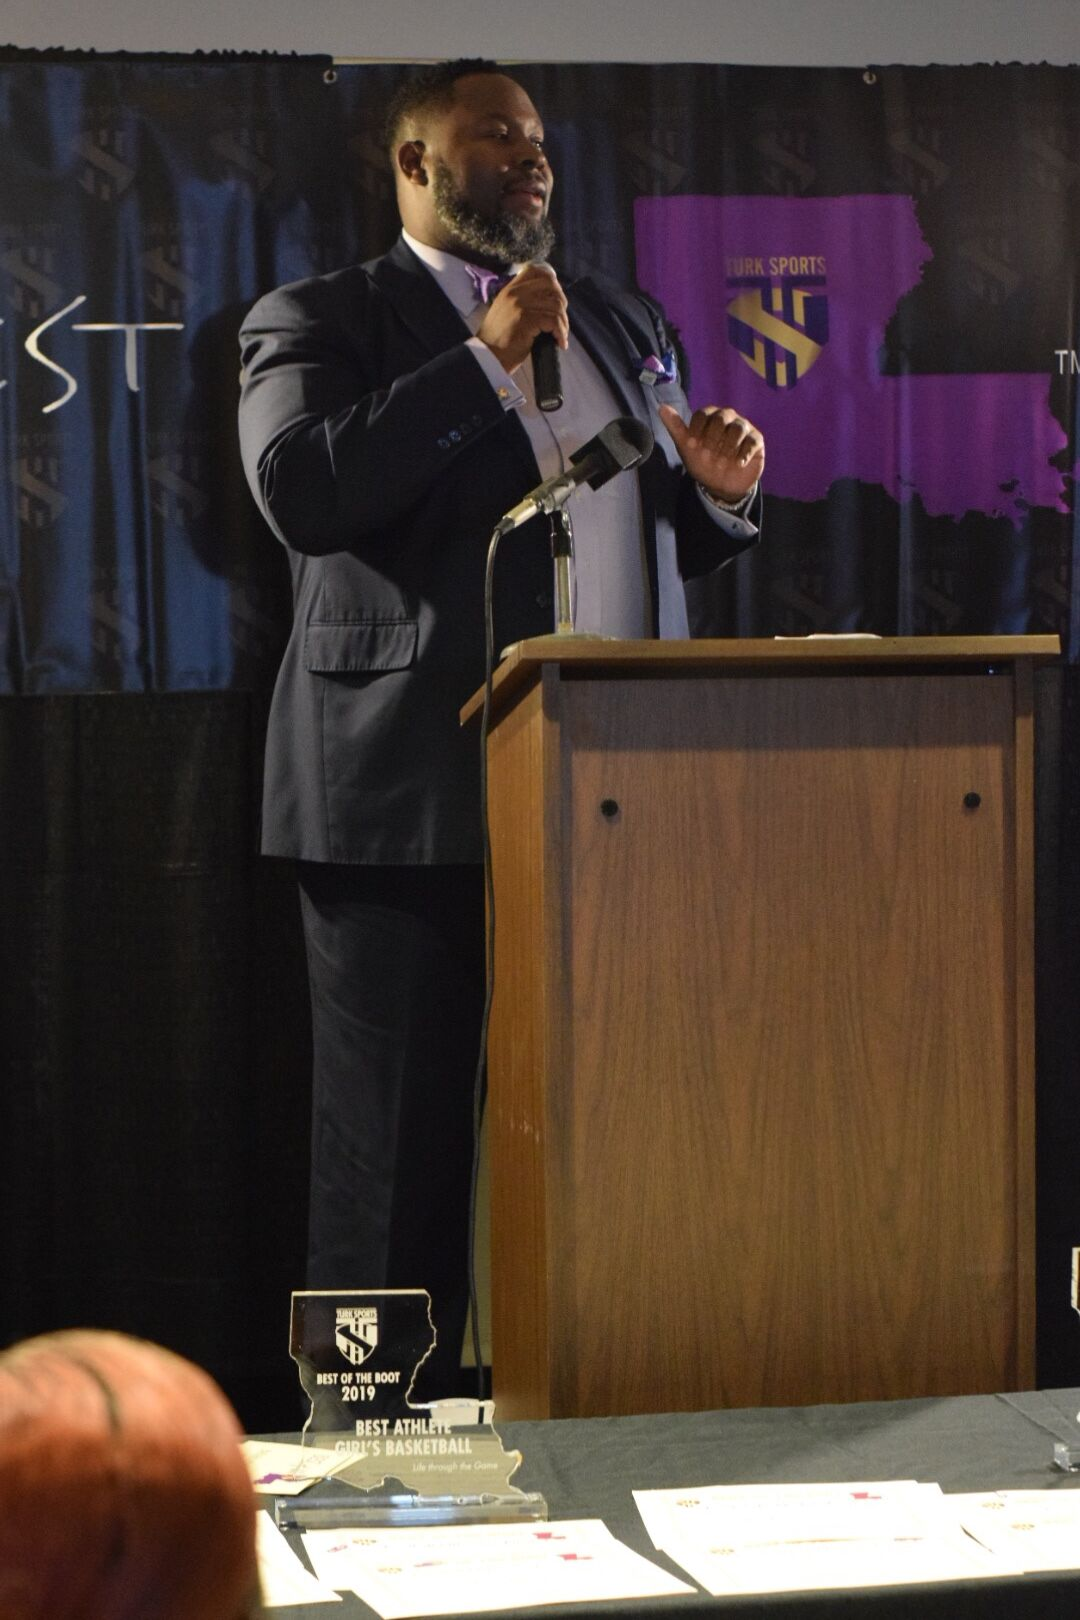 2019 Keynote Speaker Bernard Robertson addresses the audience.